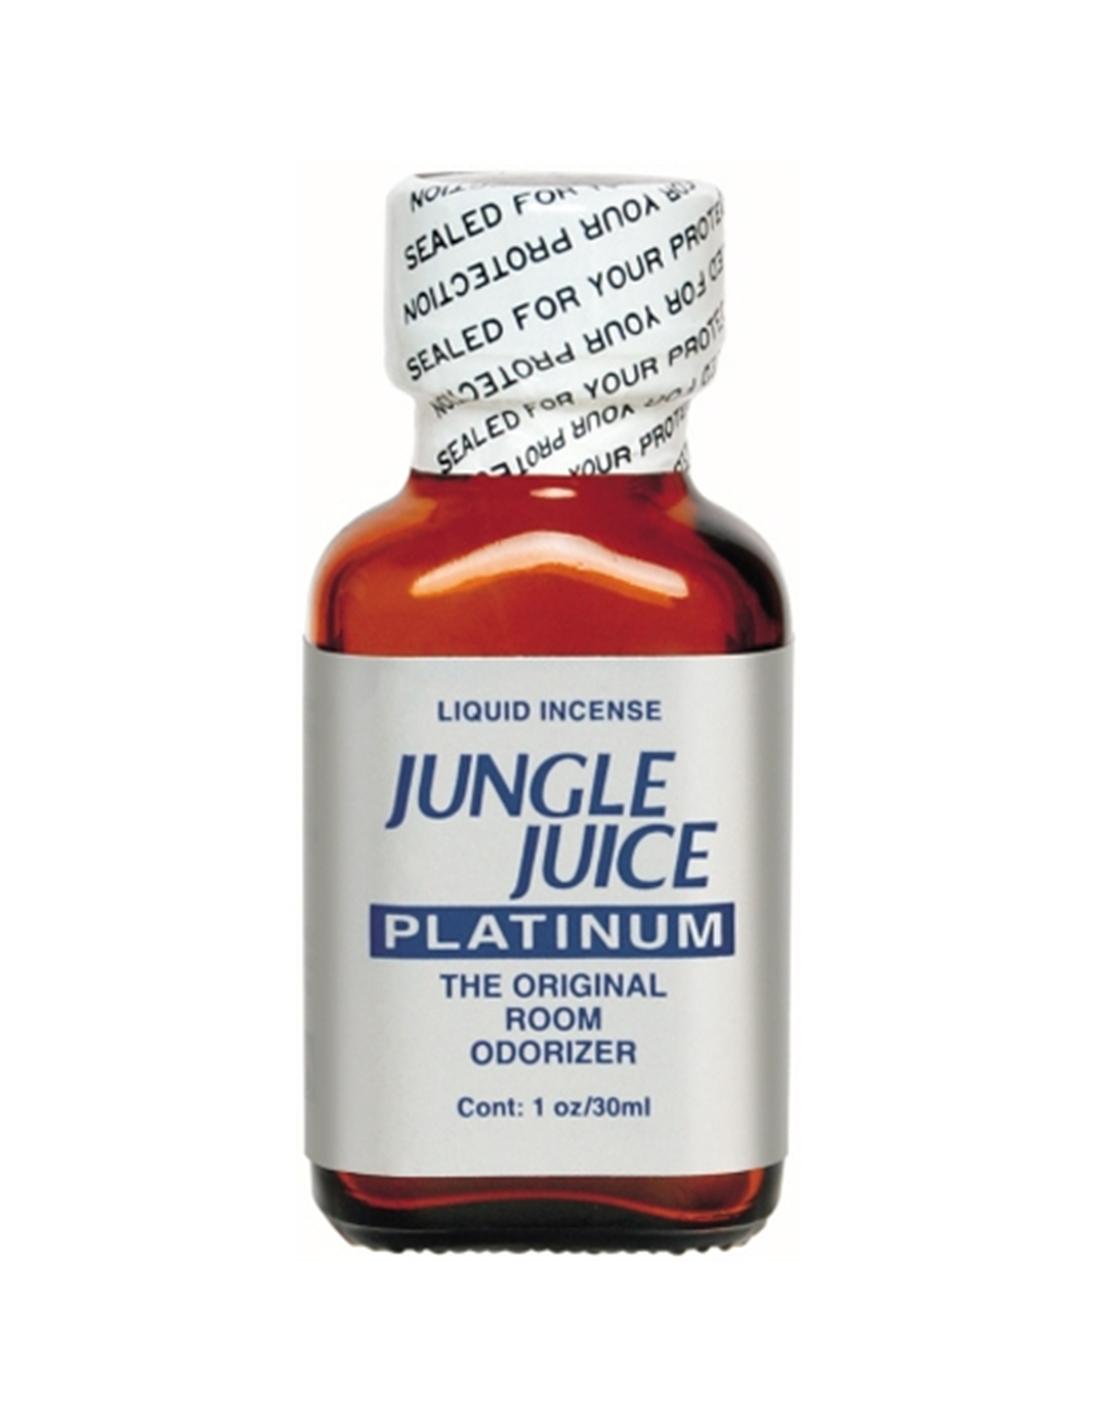 Jungle Juice Platinum 24ml - PR2010319158